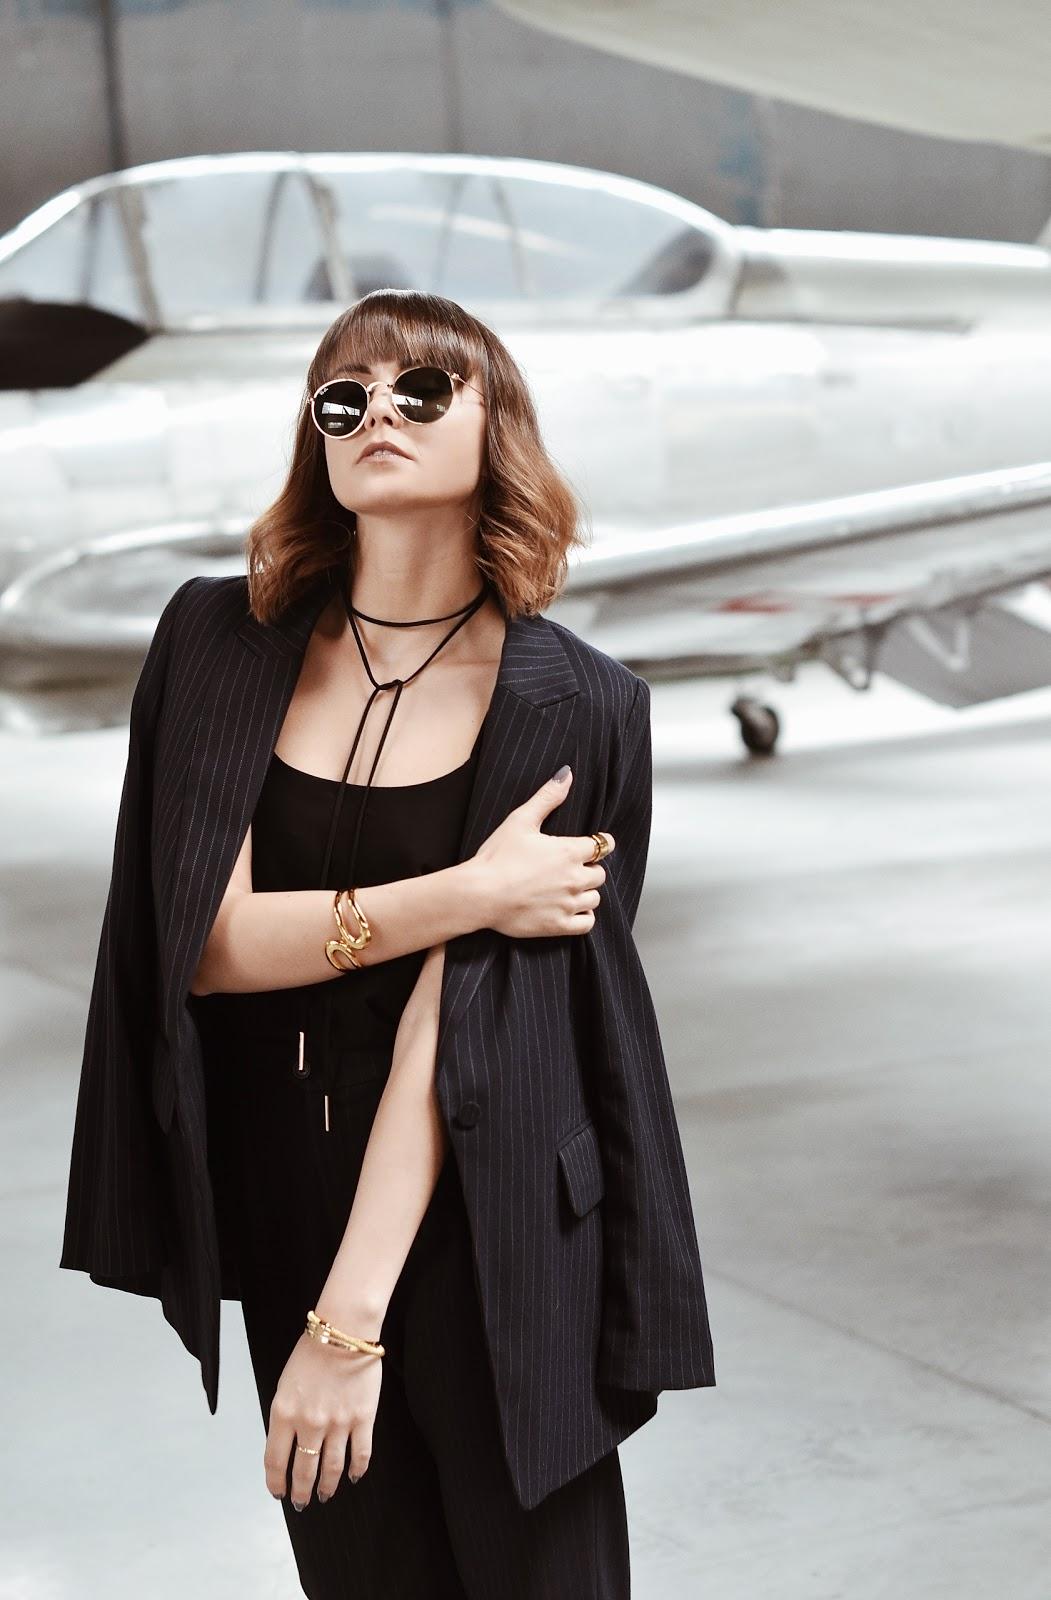 blog o modzie | blogerka modowa | ray ban |